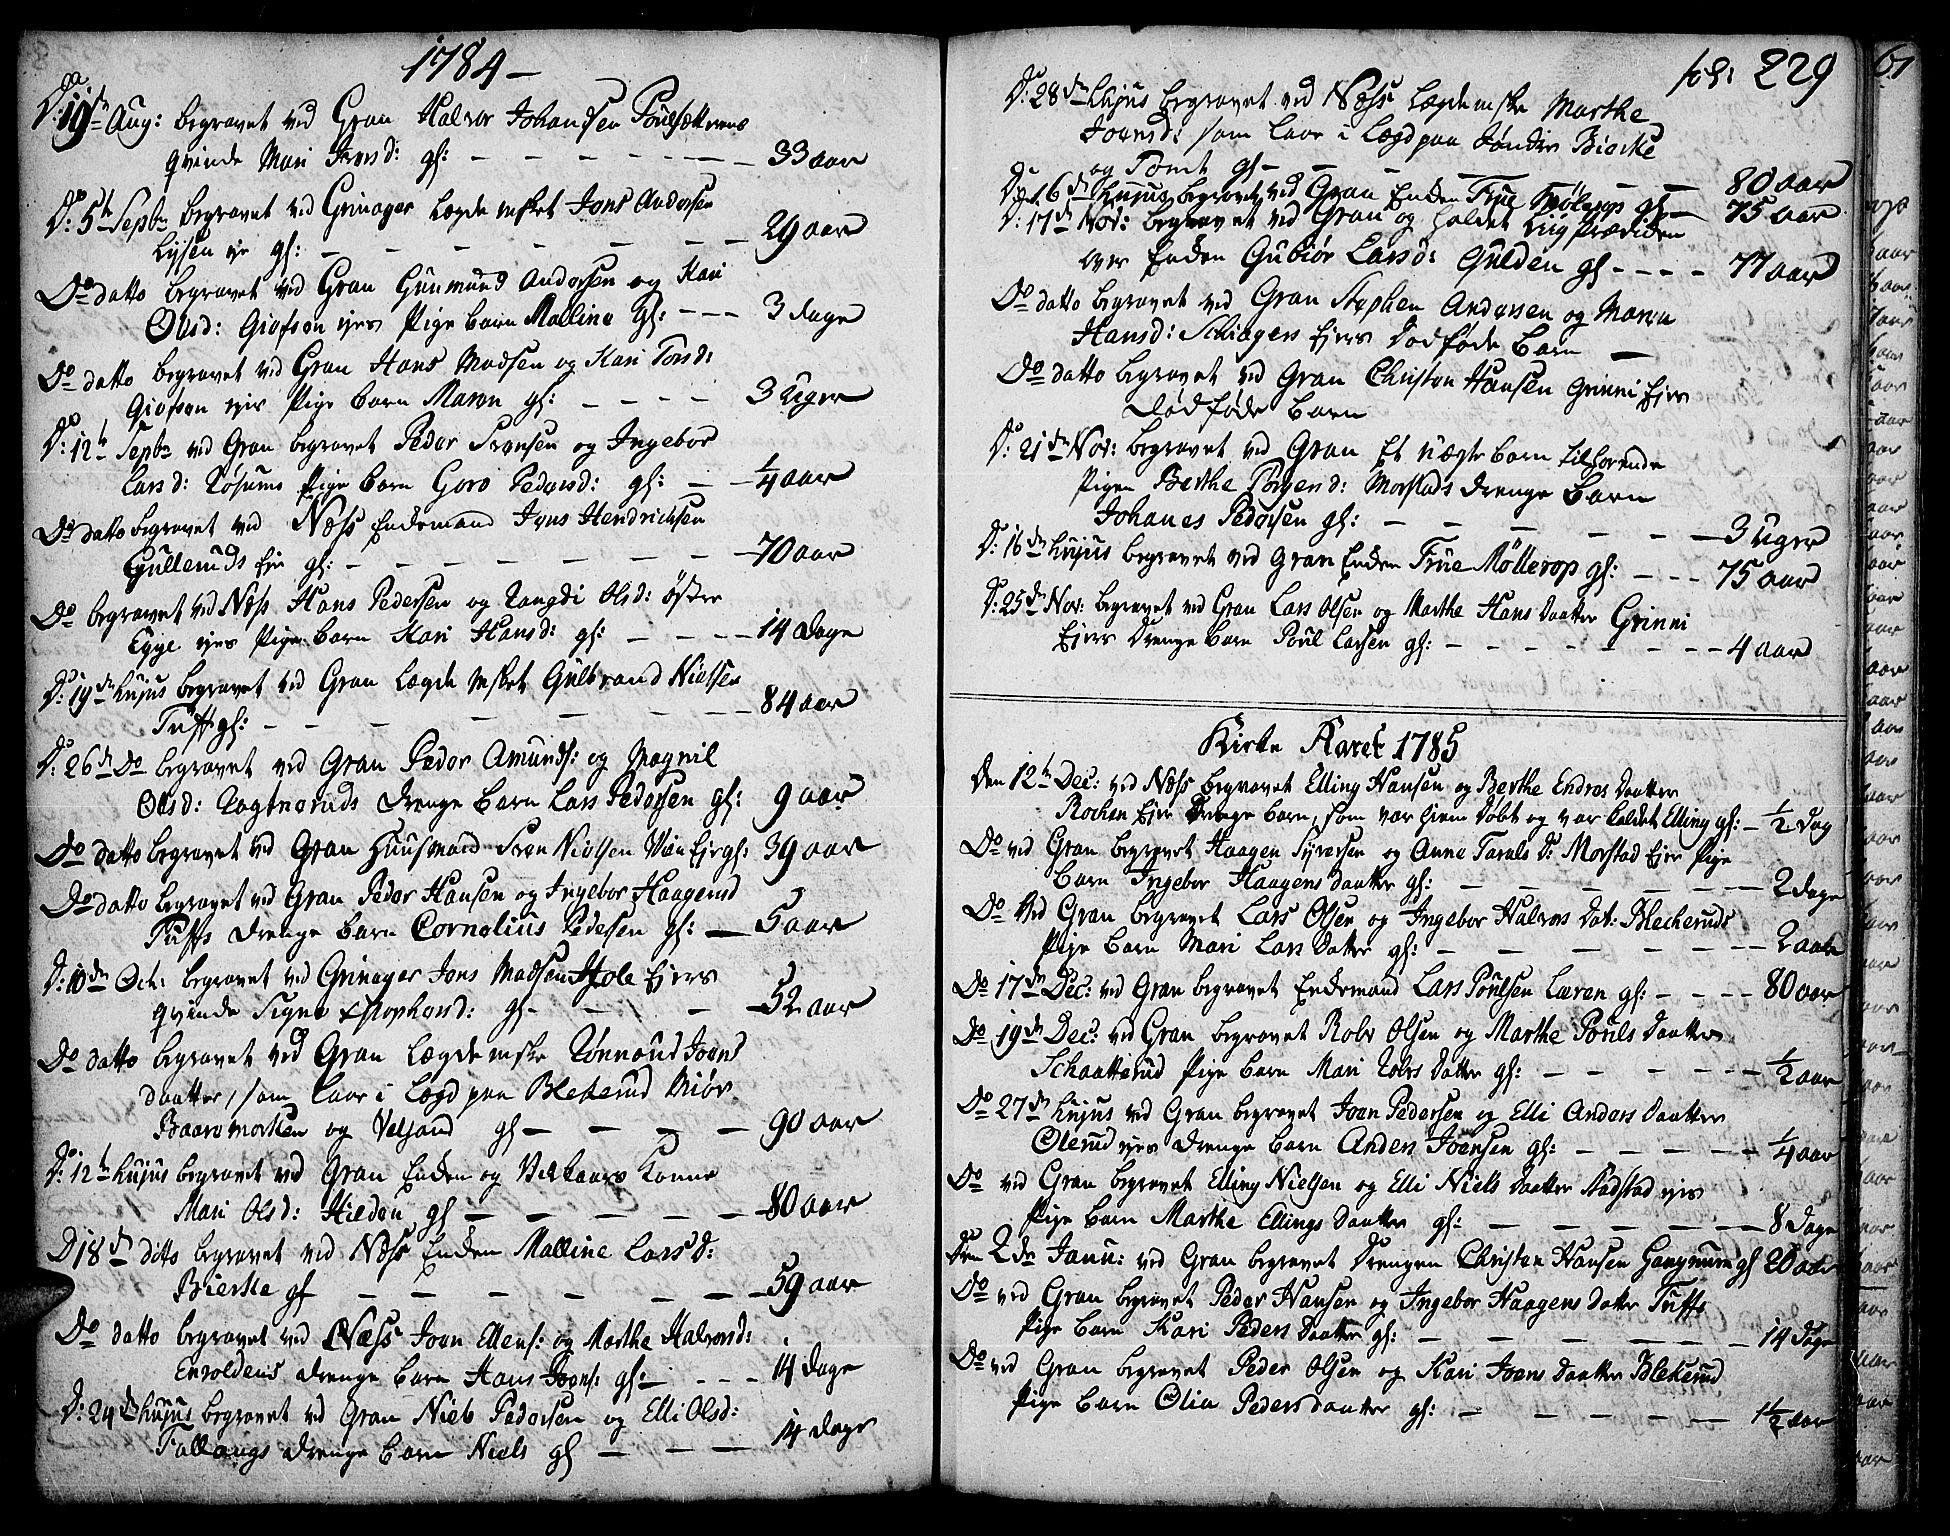 SAH, Gran prestekontor, Ministerialbok nr. 5, 1776-1788, s. 229